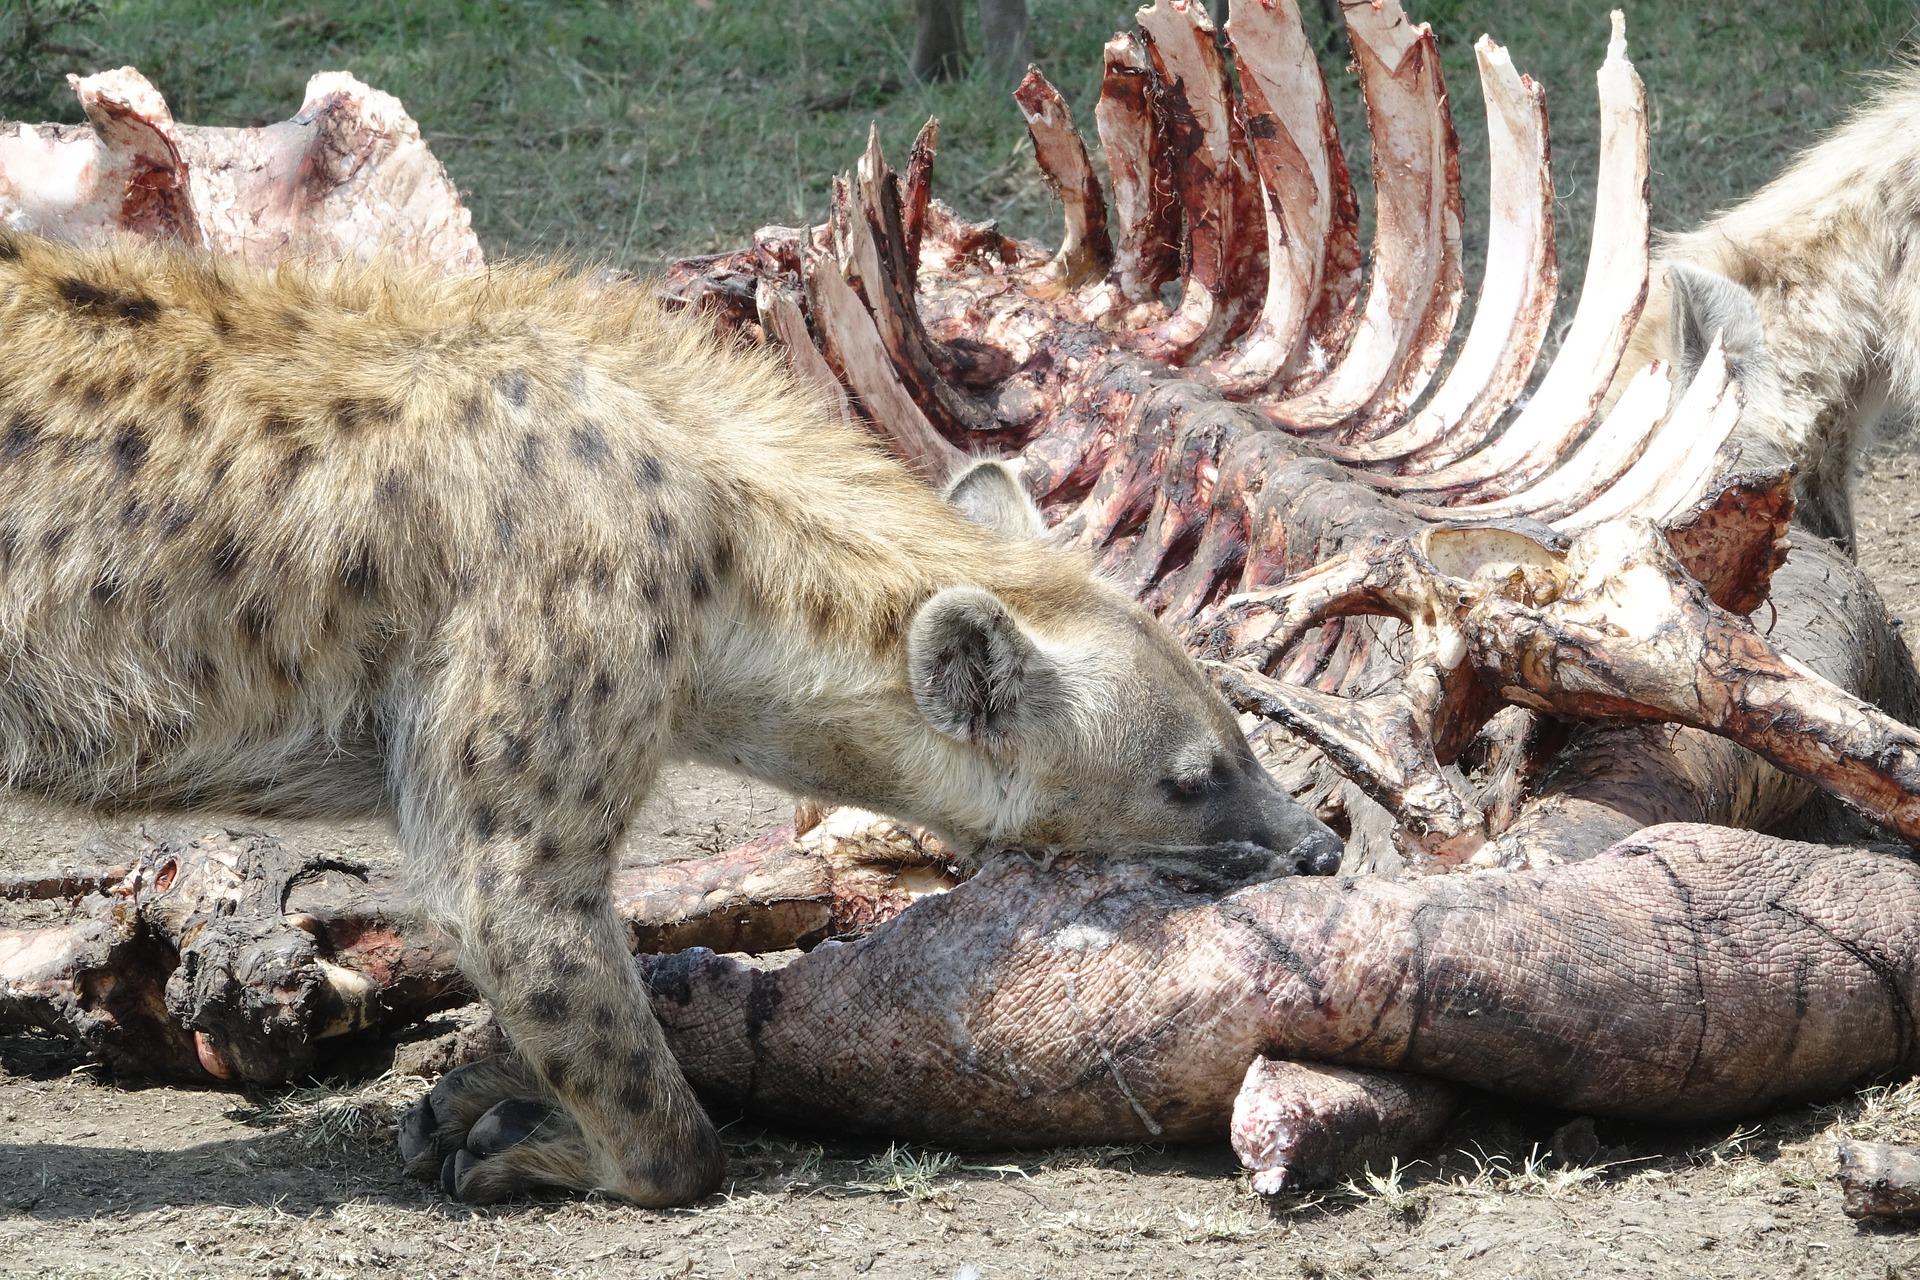 is a hyena a dog?